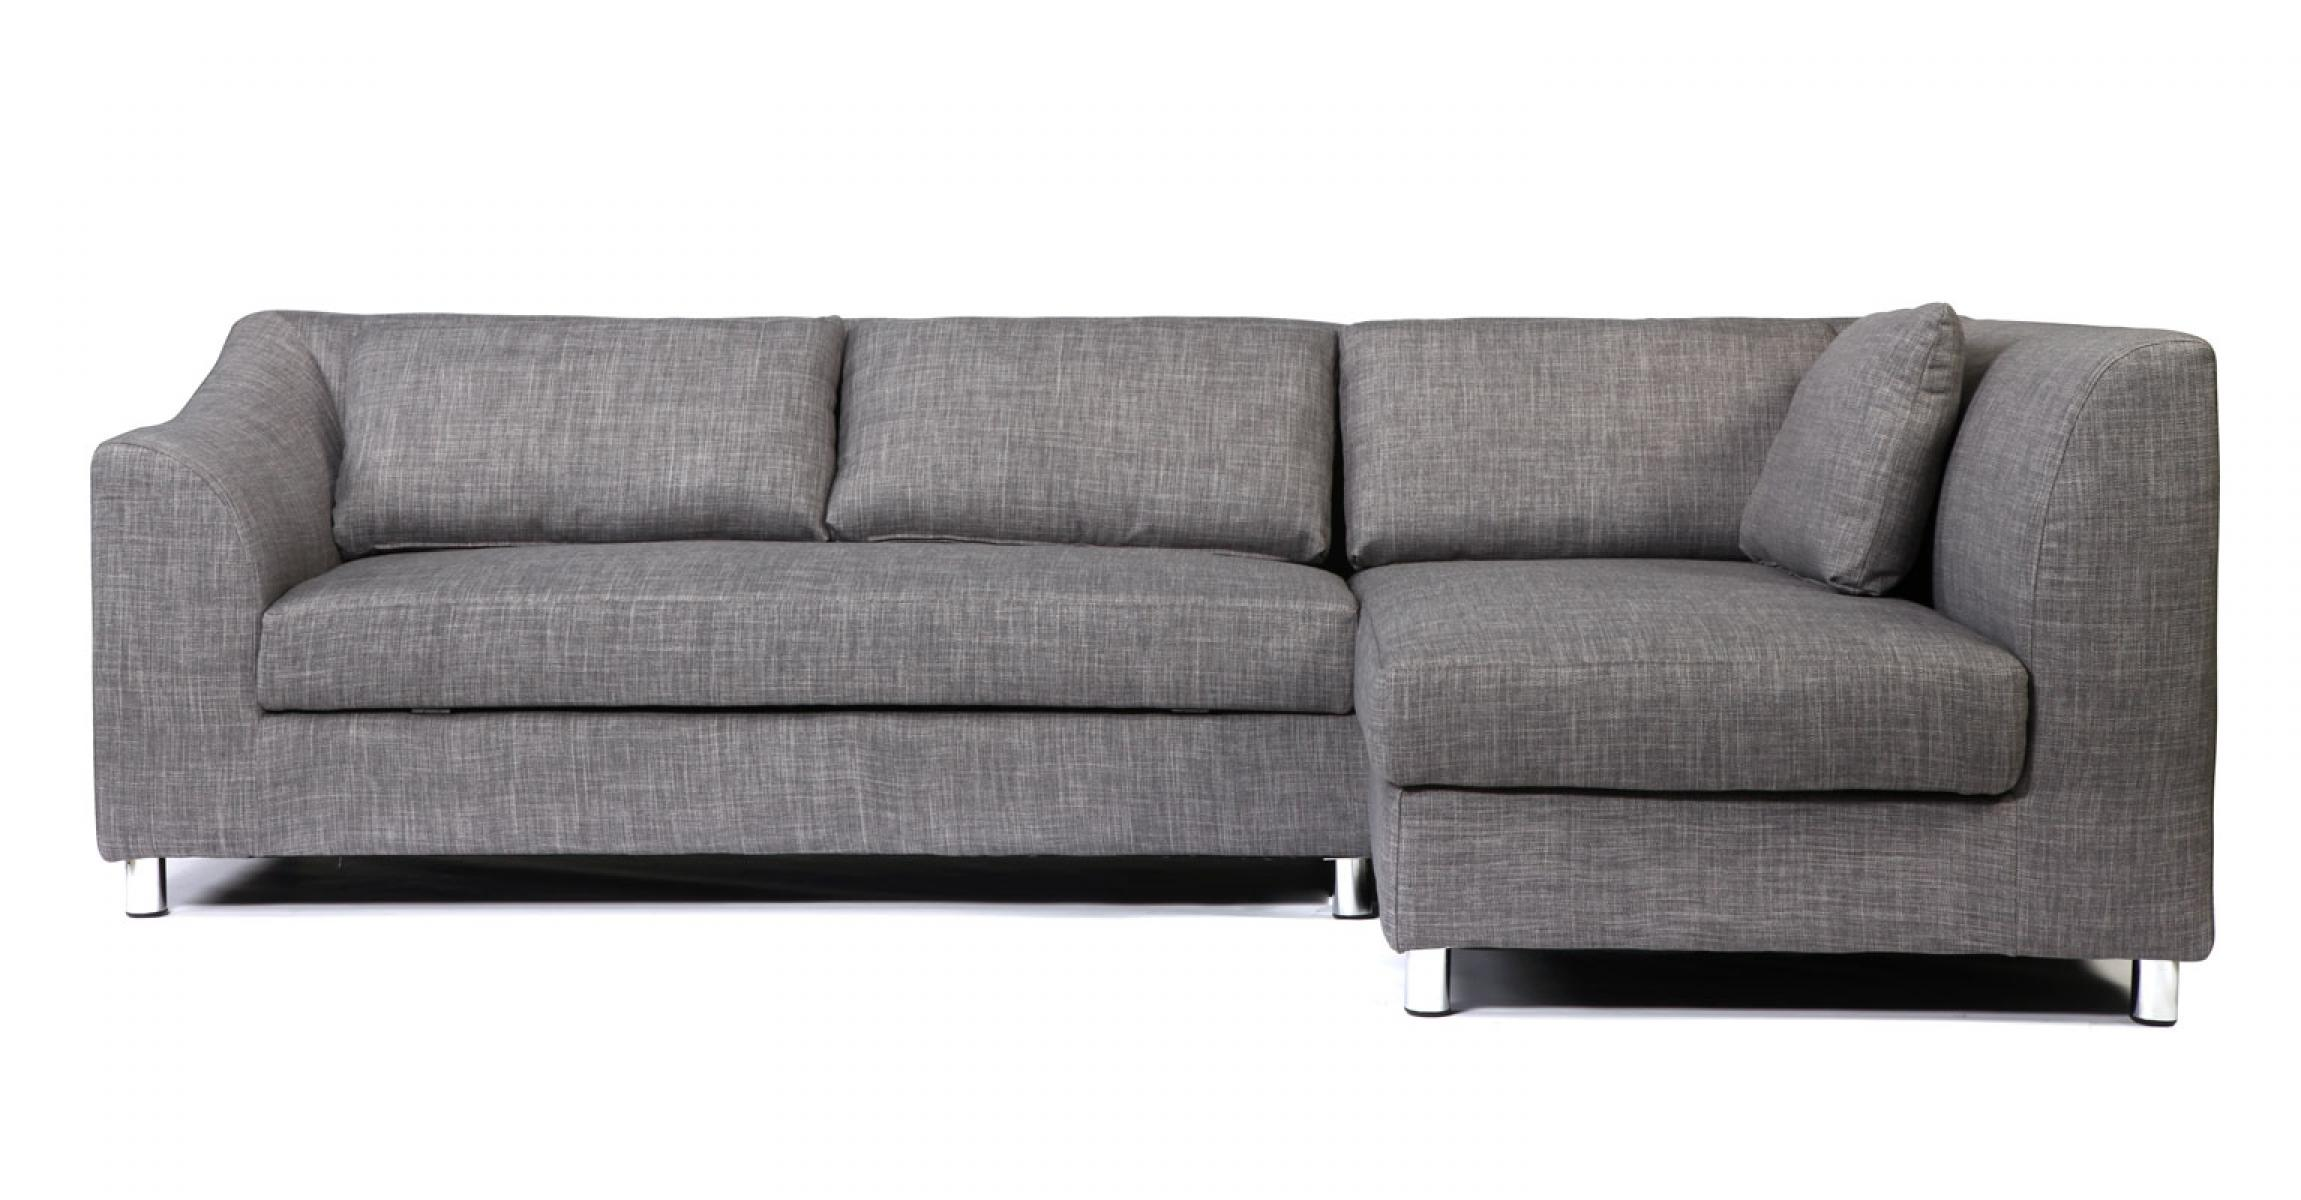 photos canap convertible pas cher. Black Bedroom Furniture Sets. Home Design Ideas